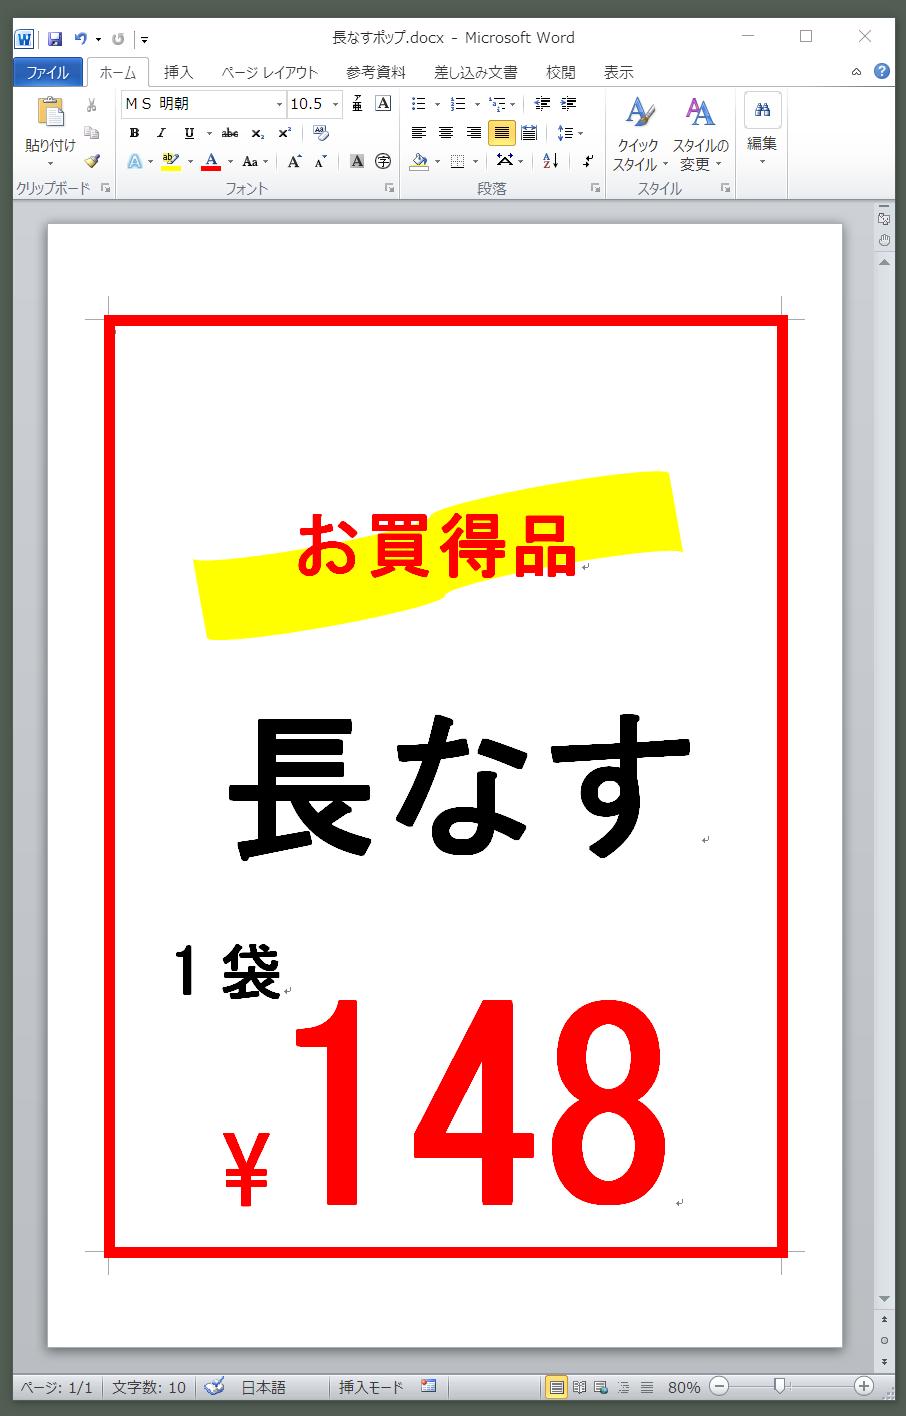 104efb700dbae279e930c97df6394b4e[1]